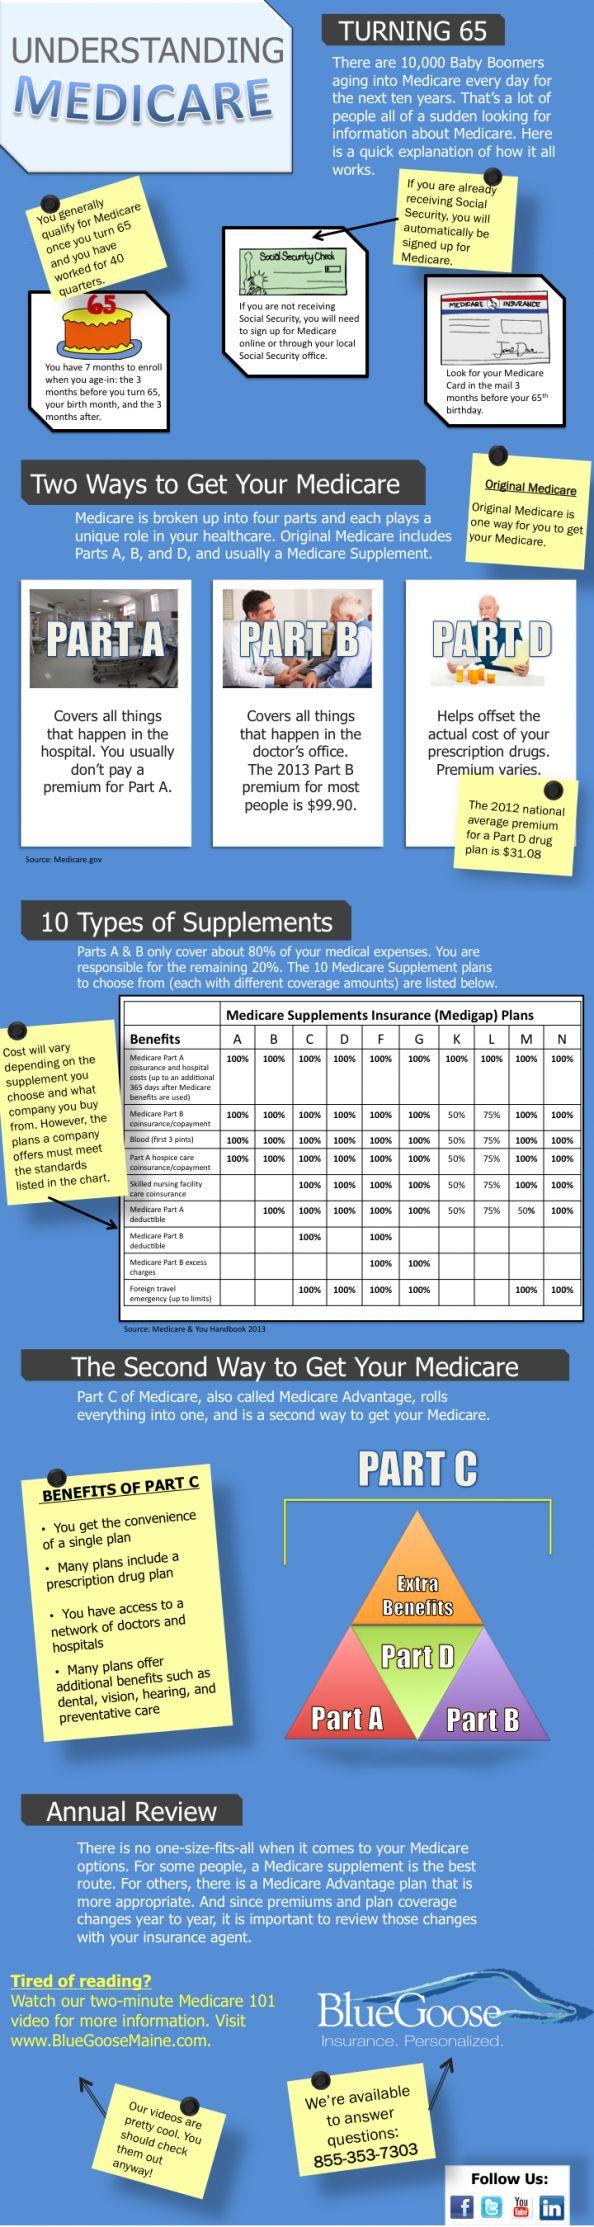 Medicare Enrollment Guide Infographic #eTeleQuote #SeniorsHealth #MediCare